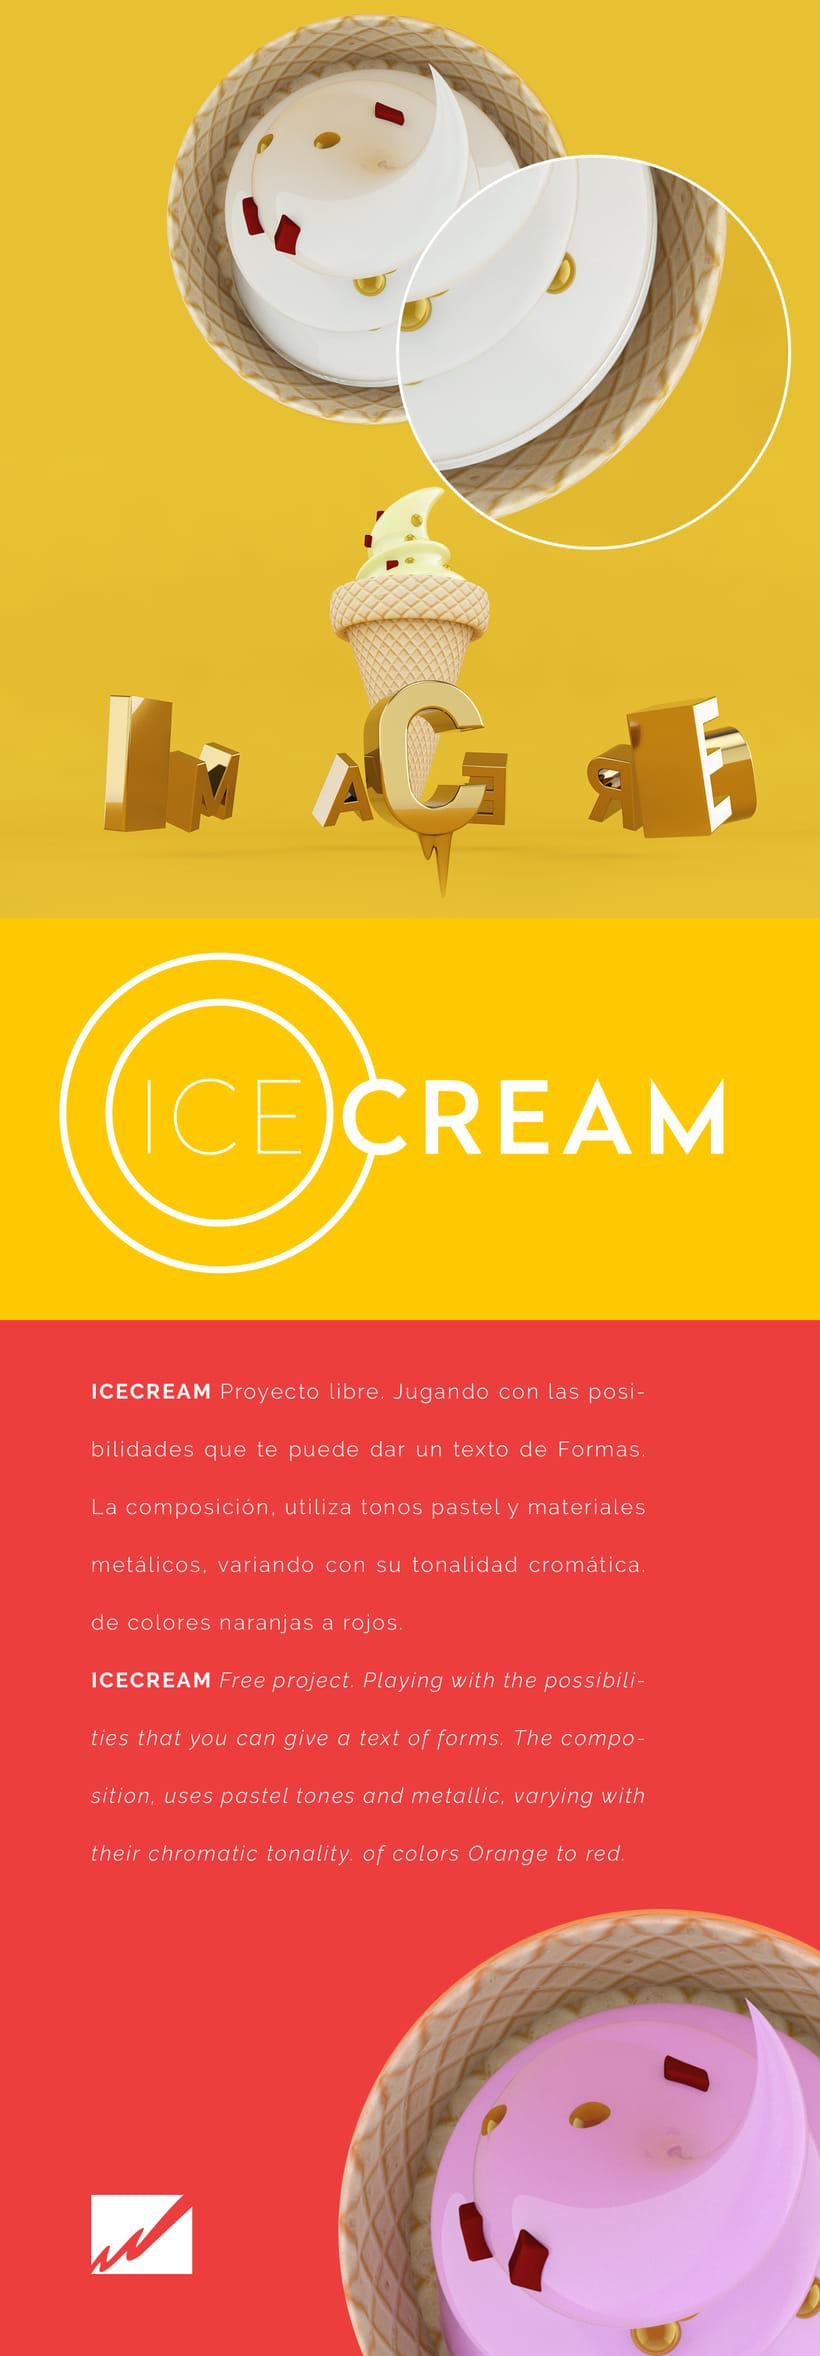 ICE-CREAM 1